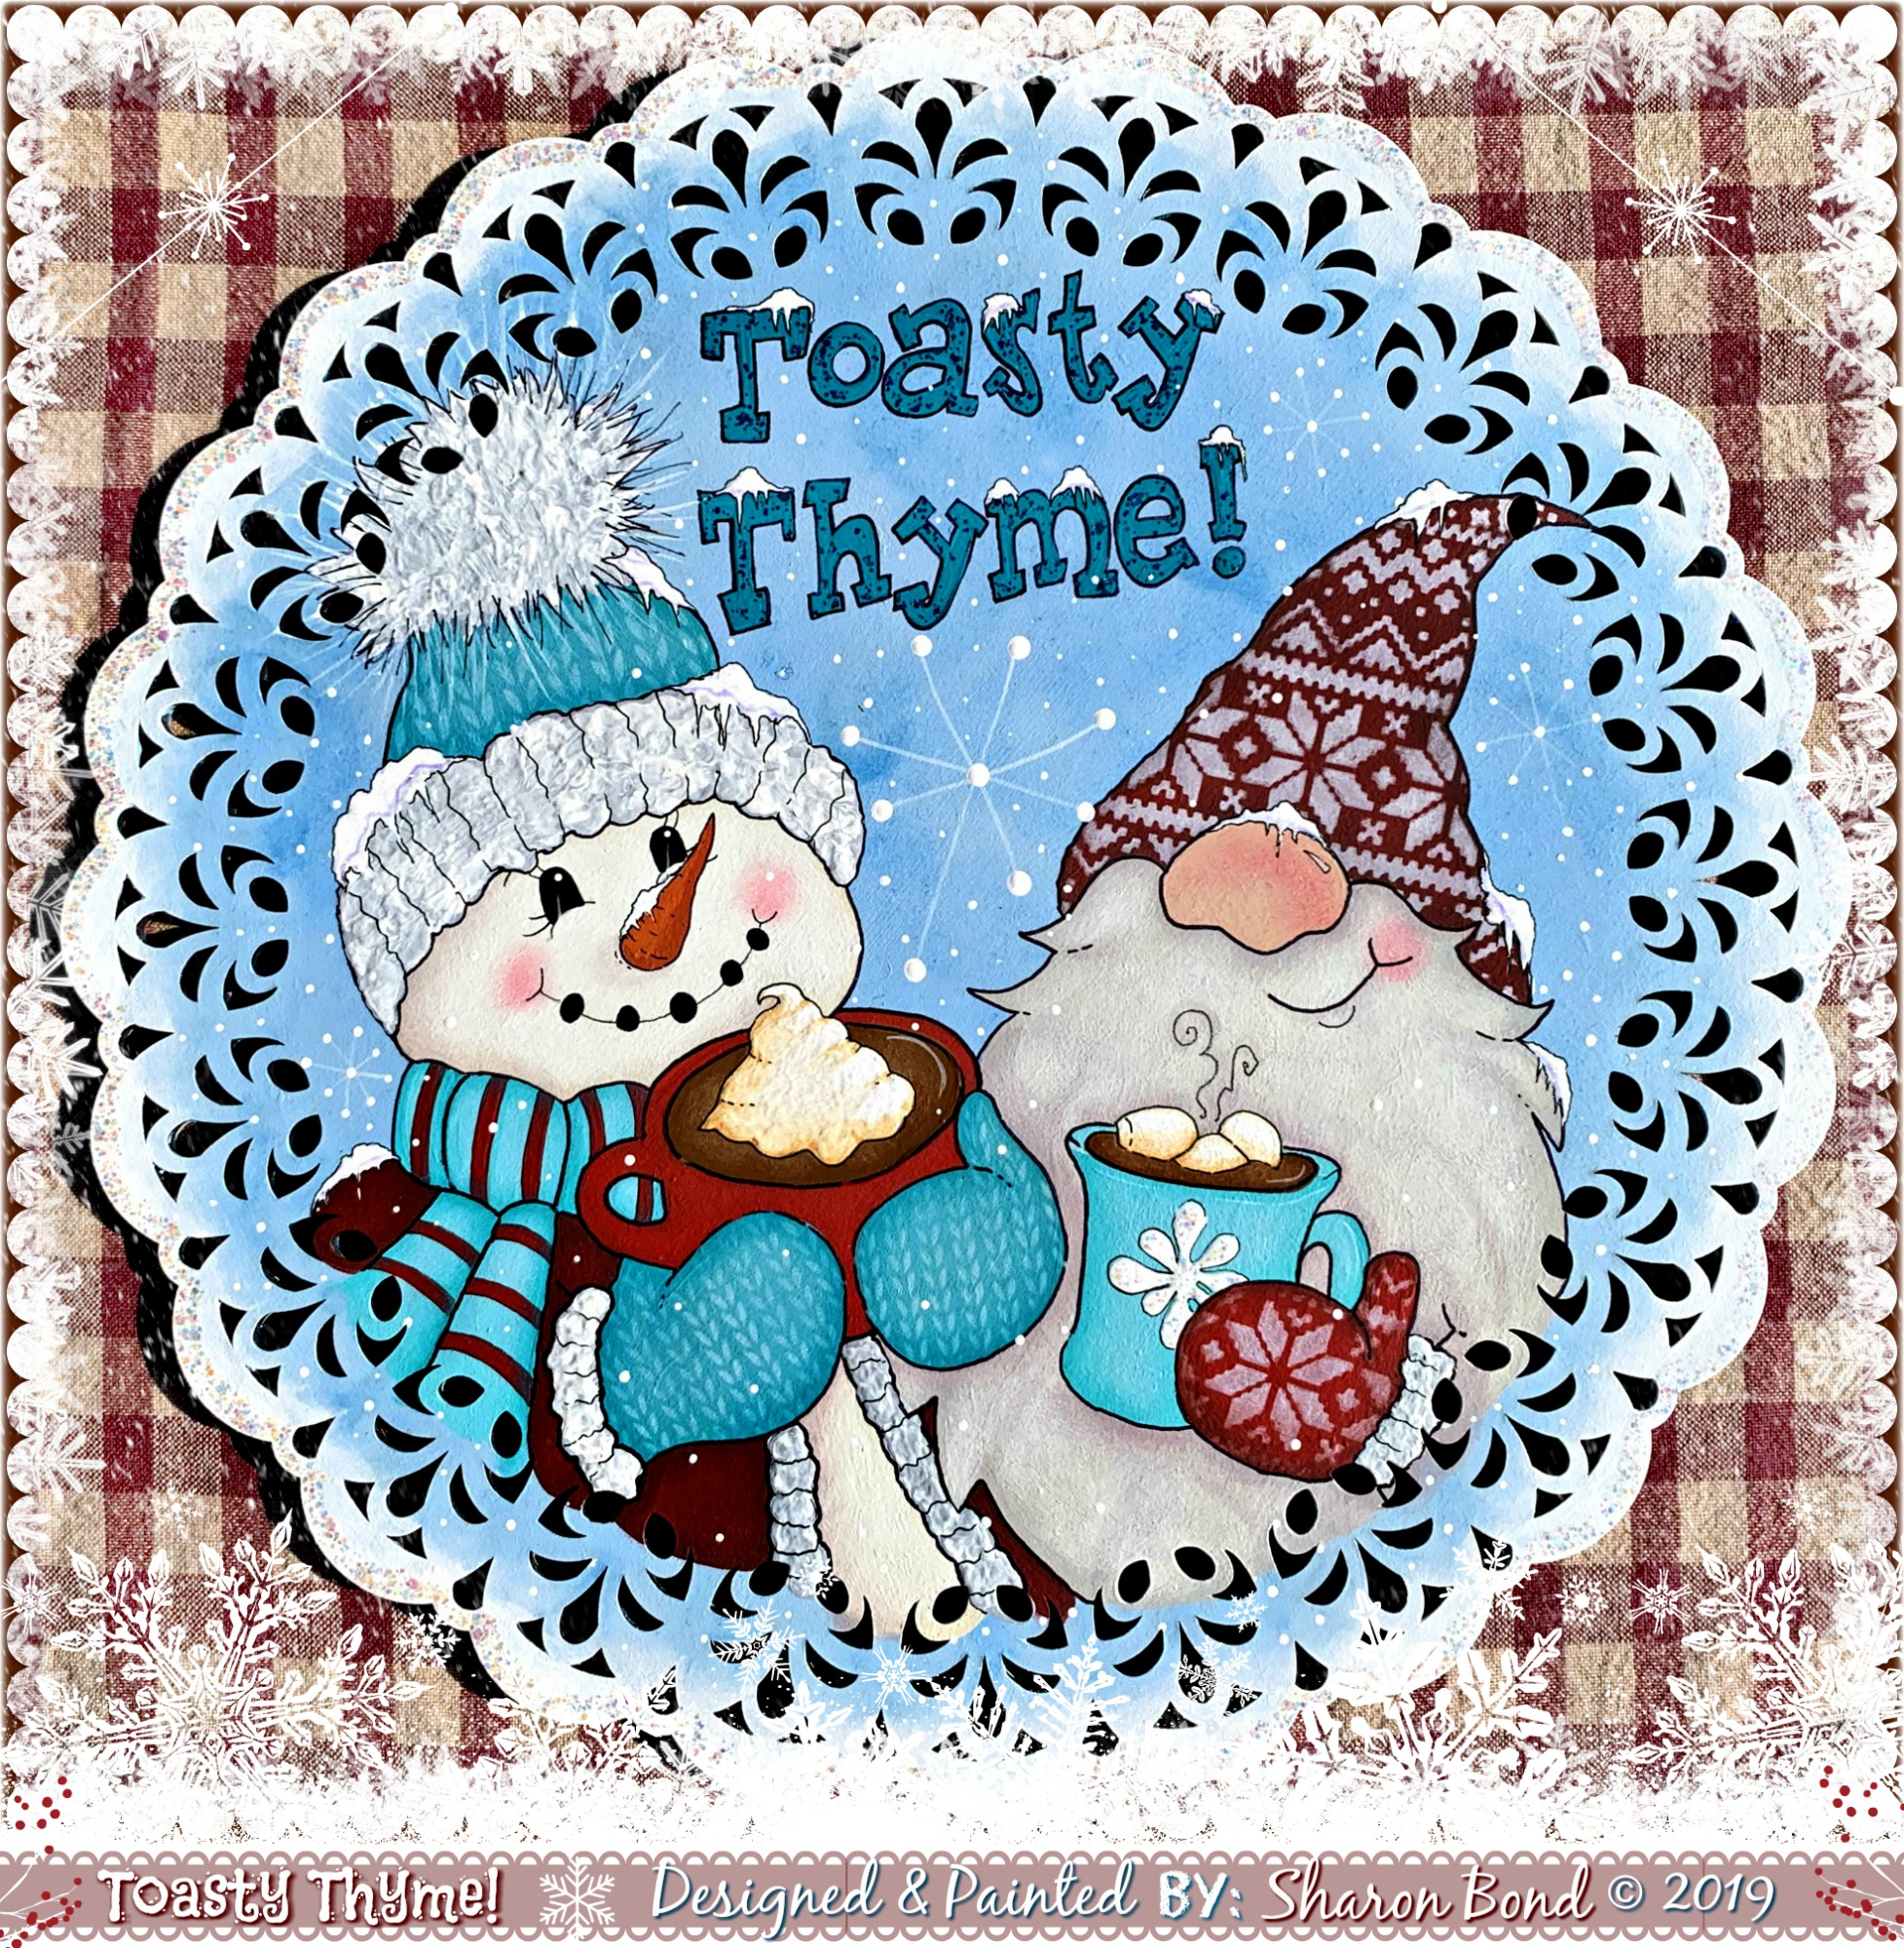 Toasty Thyme - E-Packet - Sharon Bond